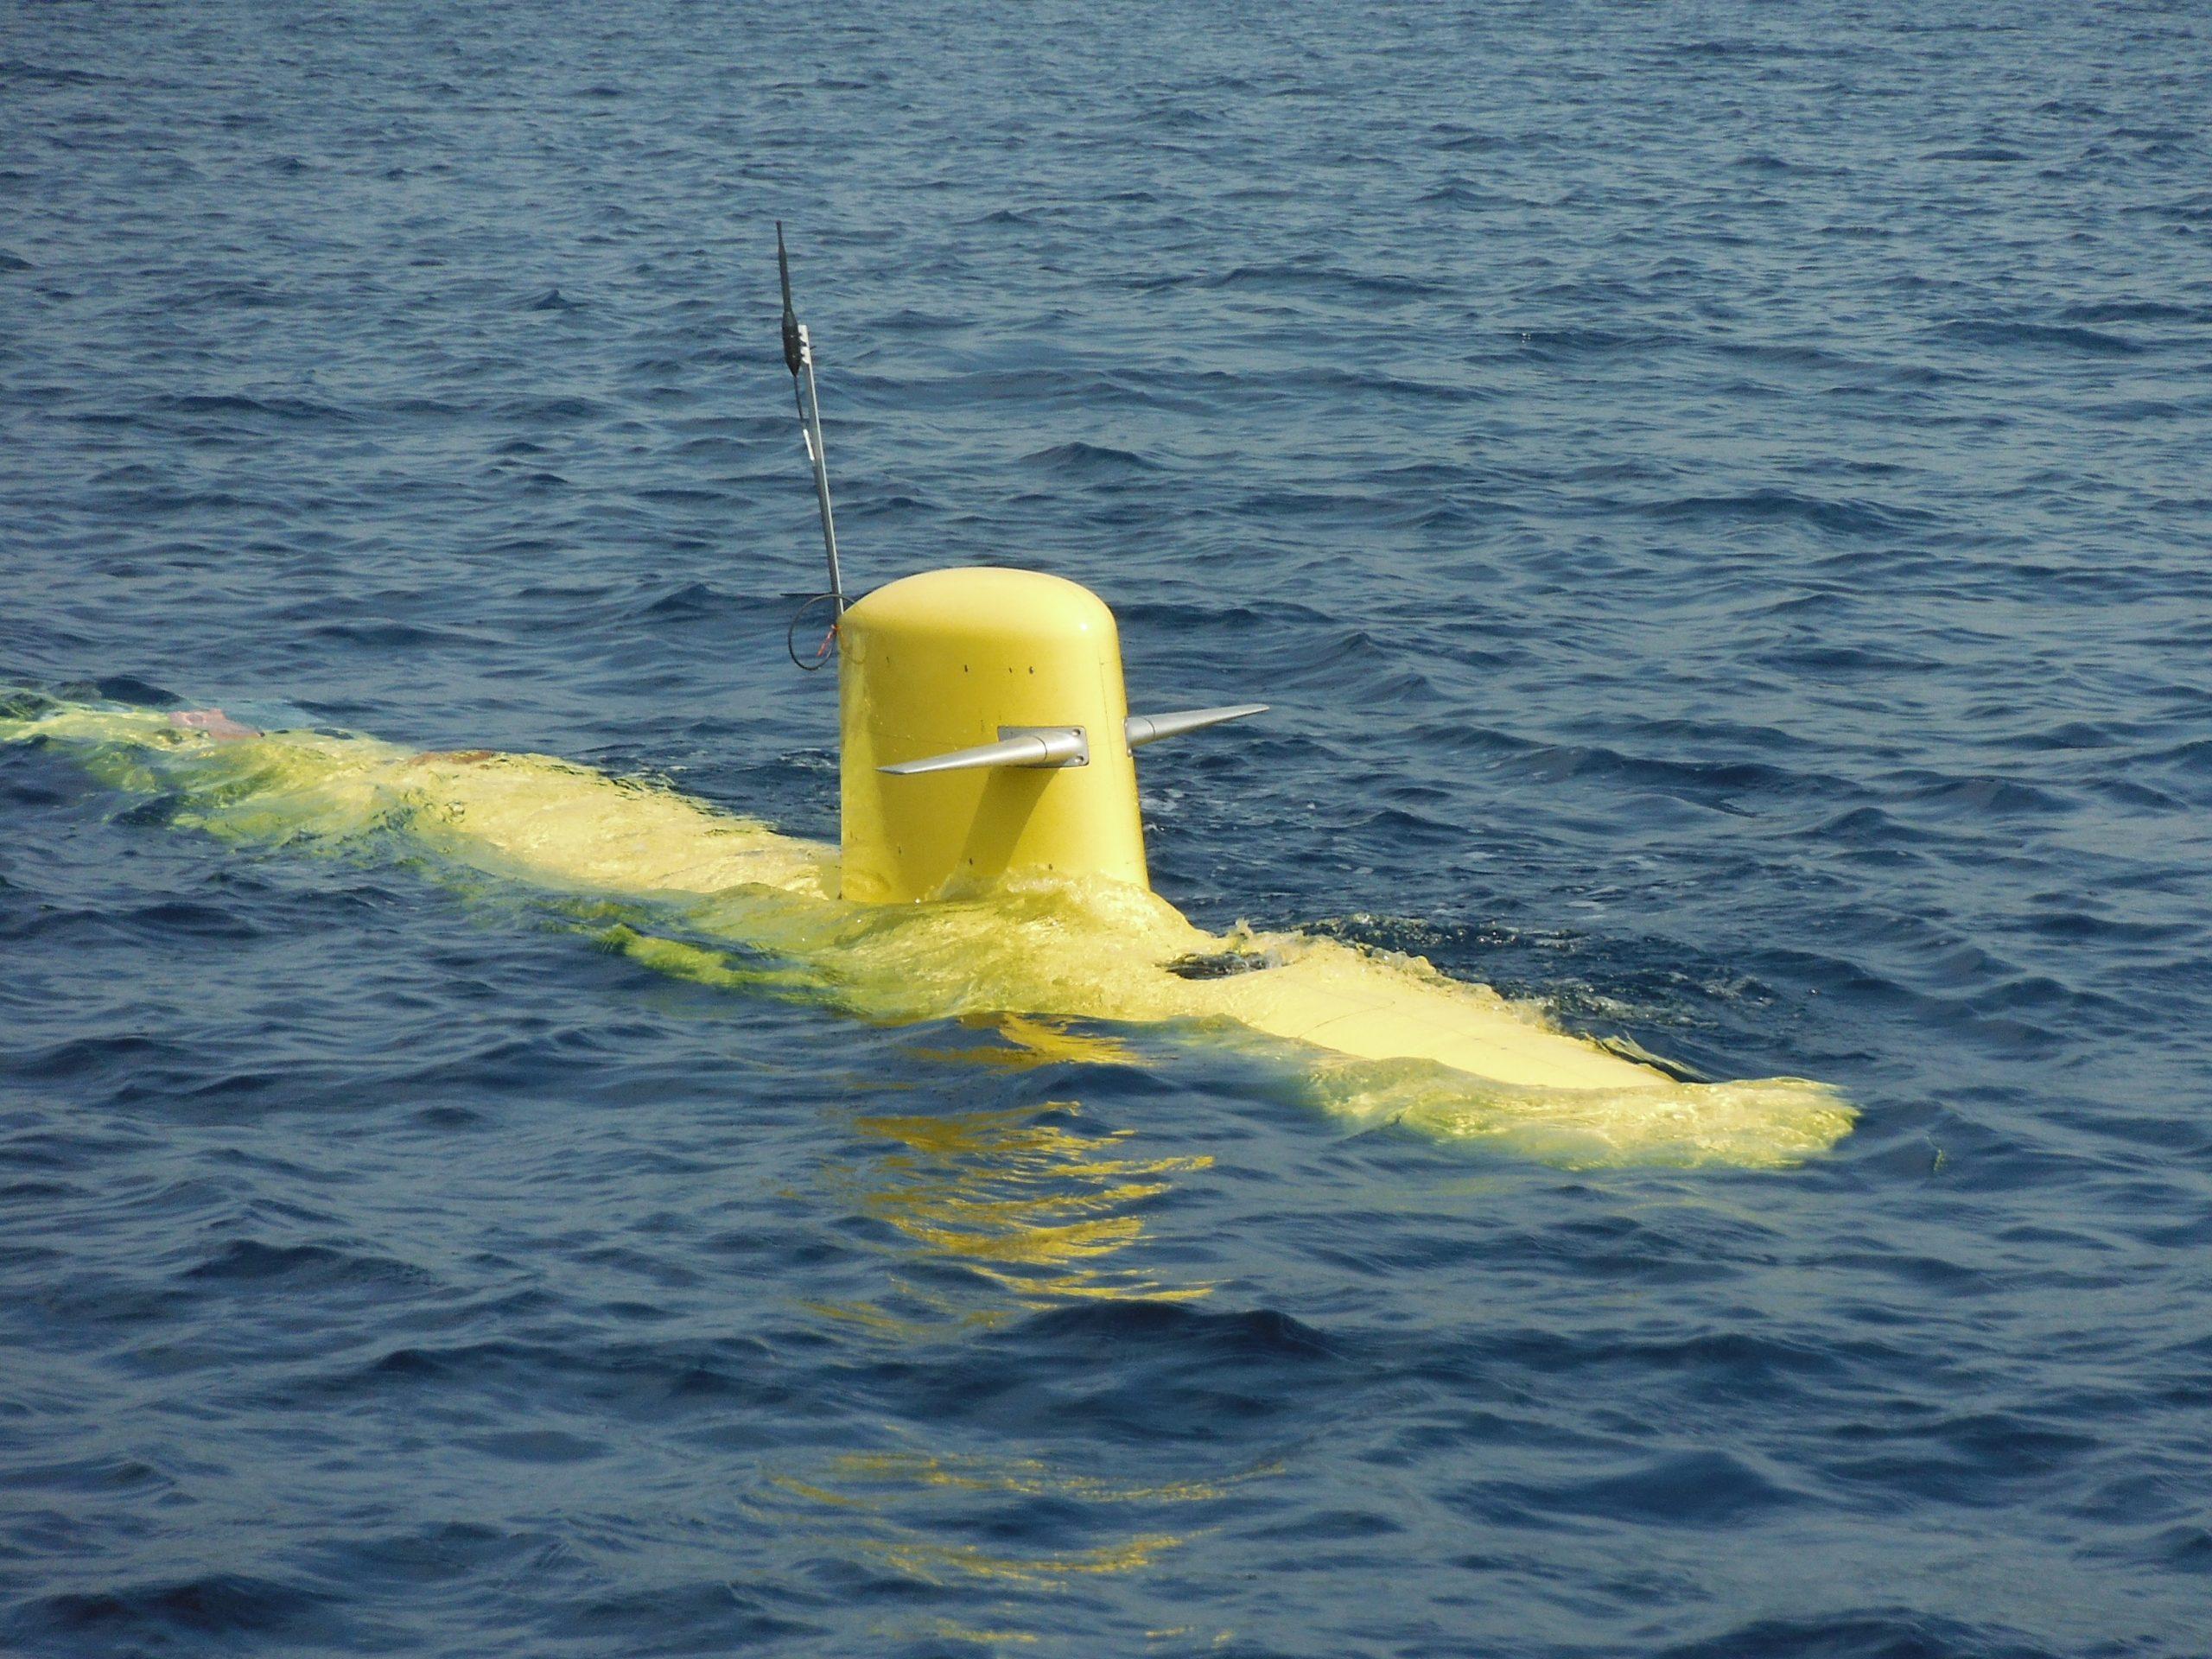 5- Max sea trial